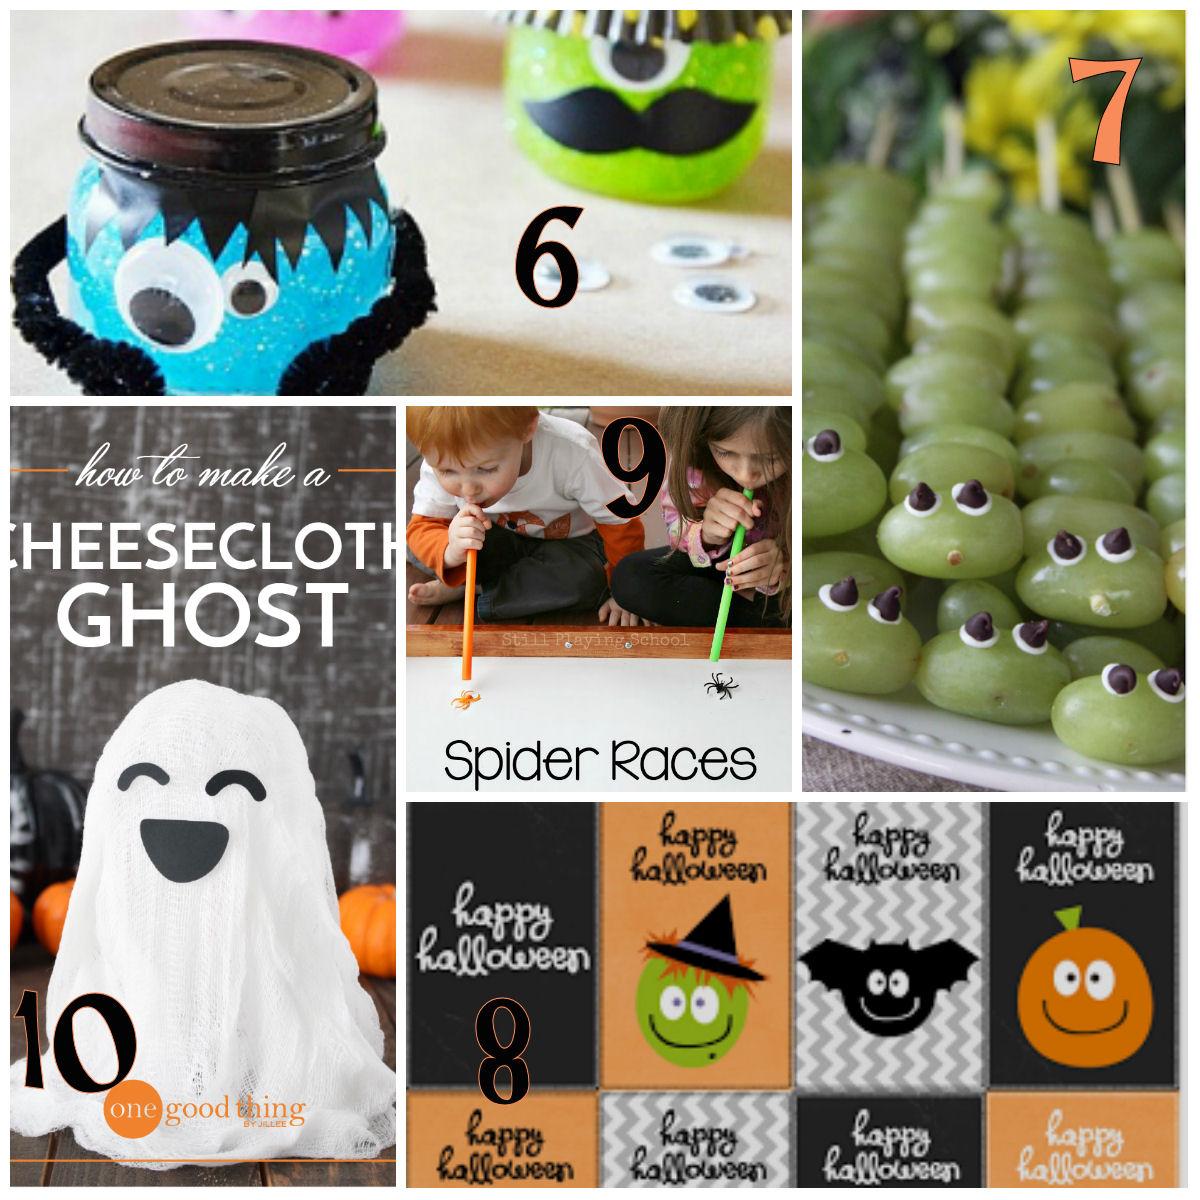 10 Paurosissime Idee Creative Per Halloween Per Bimbi Piccoli